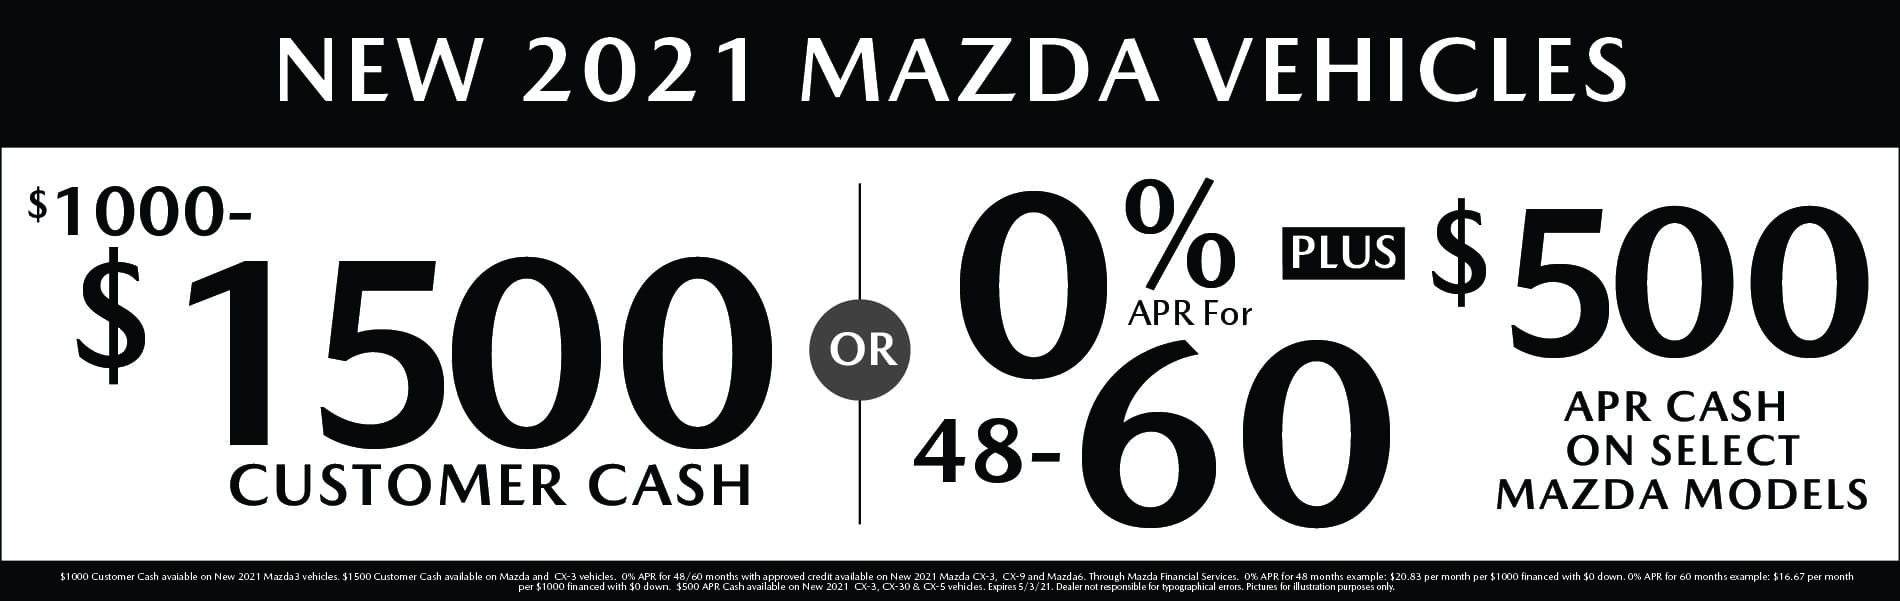 New Mazda Vehicle Specials